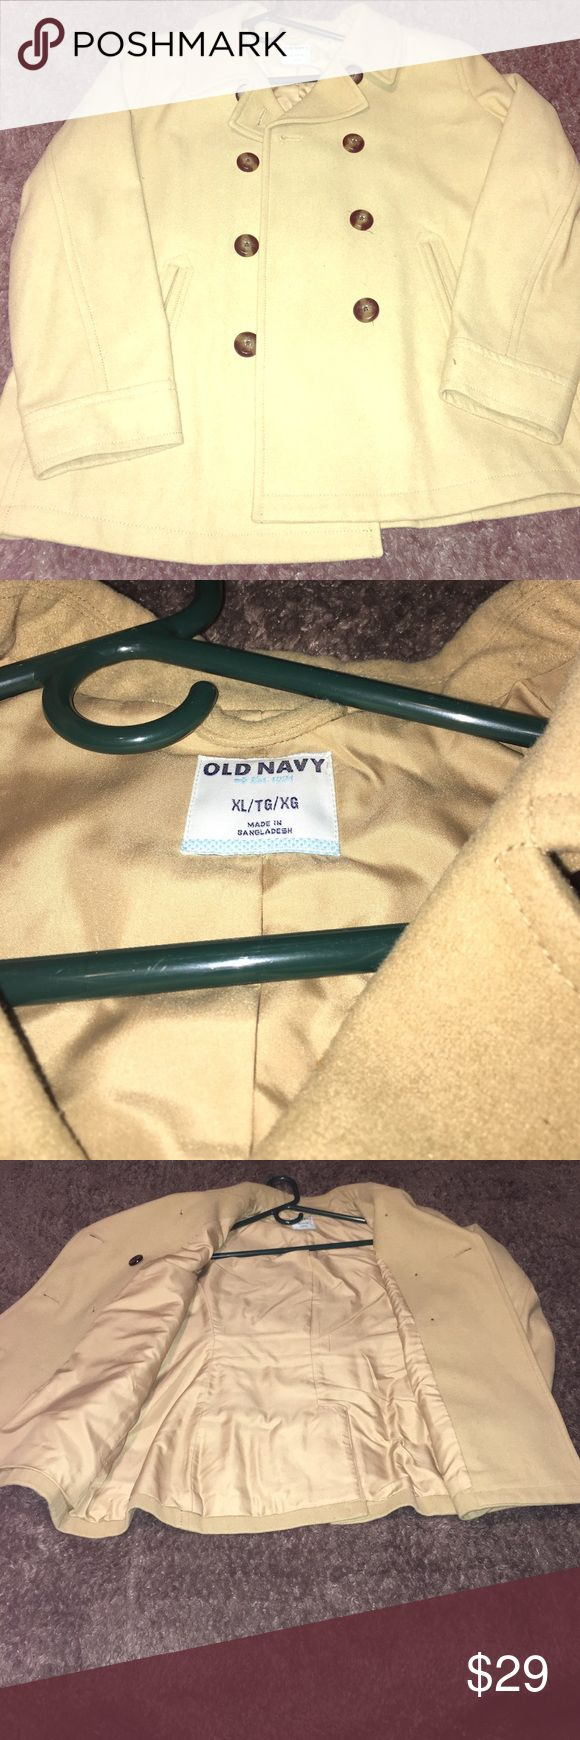 Women's coat.. like new Old Navy Pea coat... excellent condition Old Navy Jackets & Coats Pea Coats